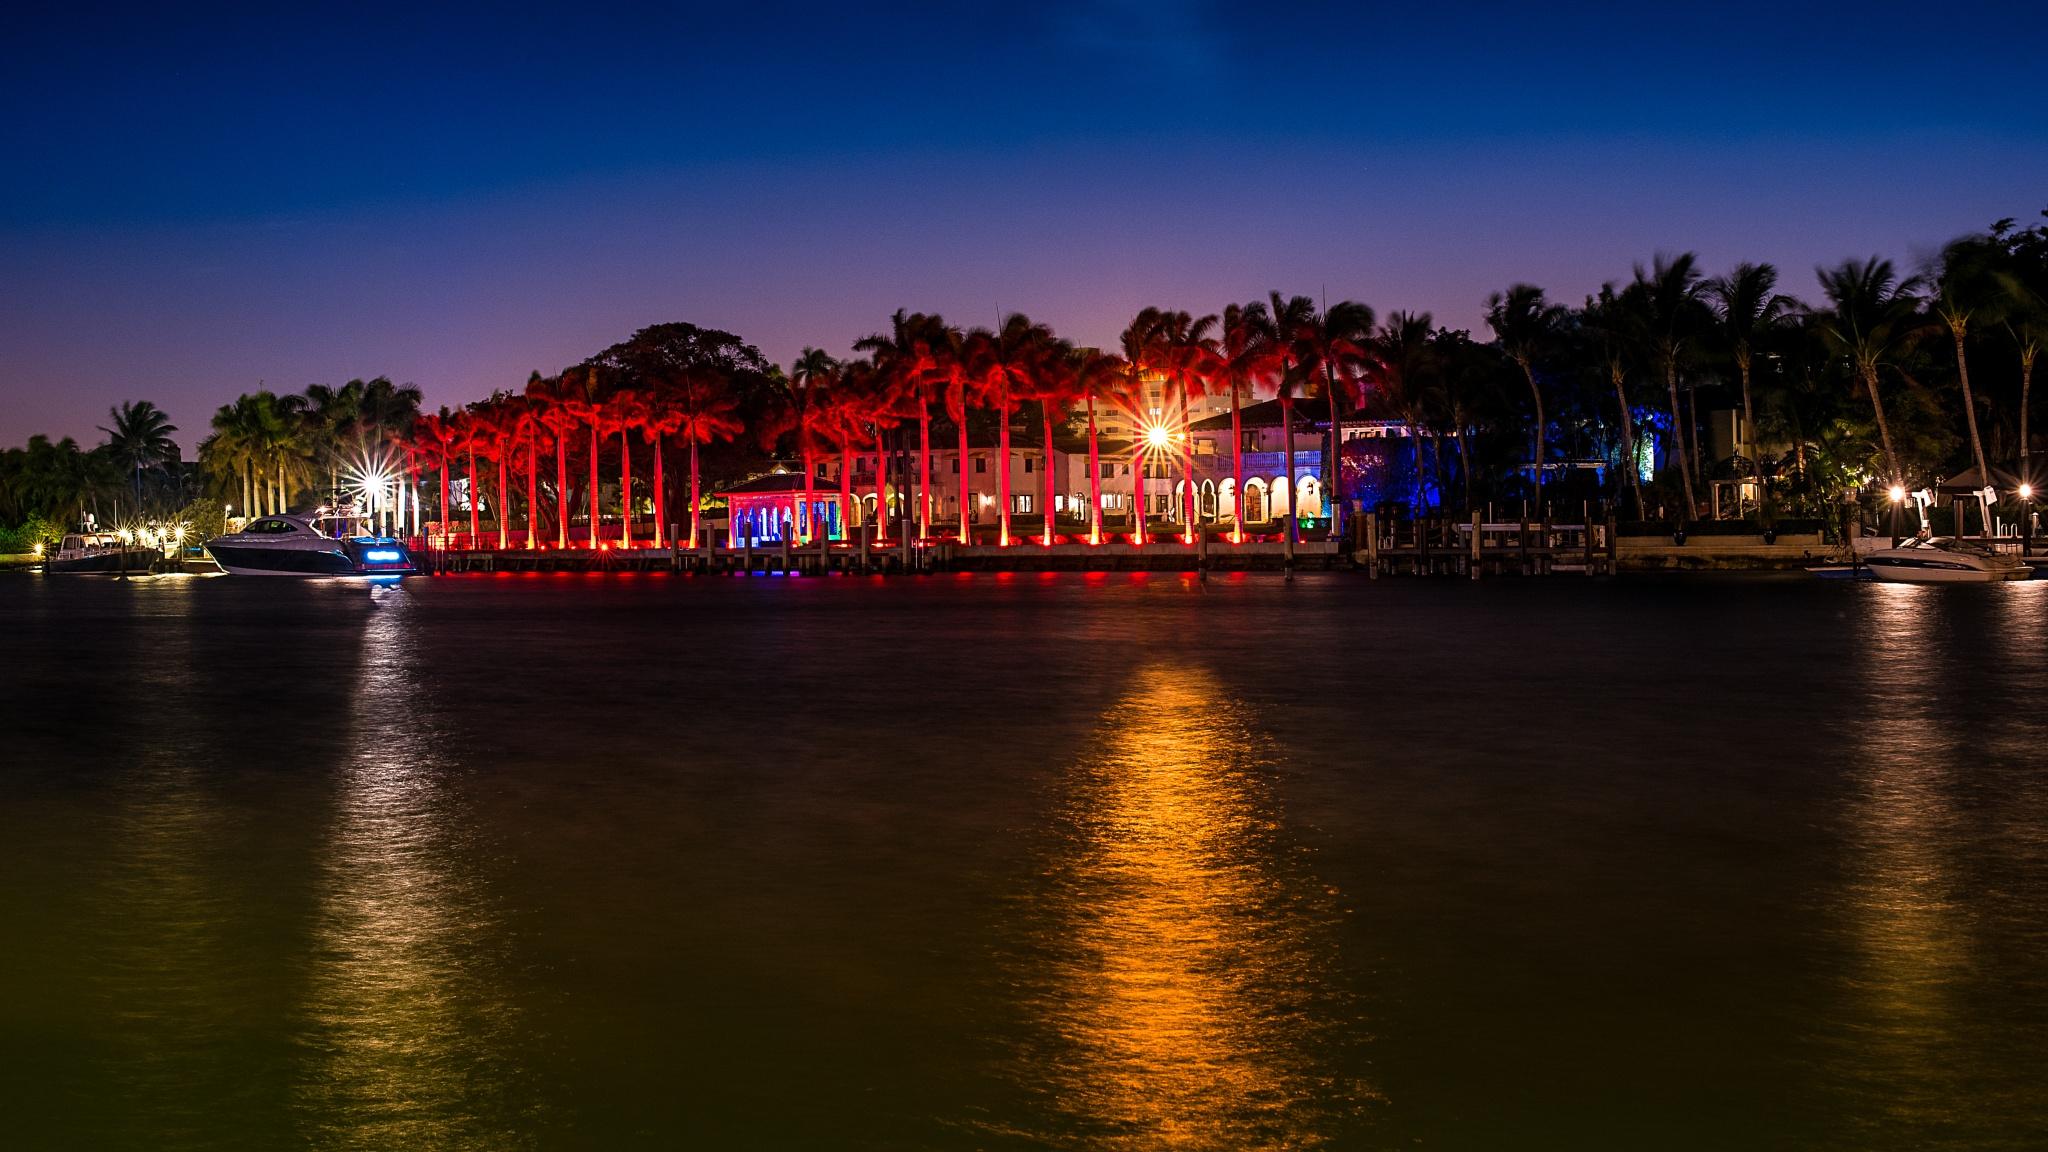 Miami by night by XavierWttrwulghe